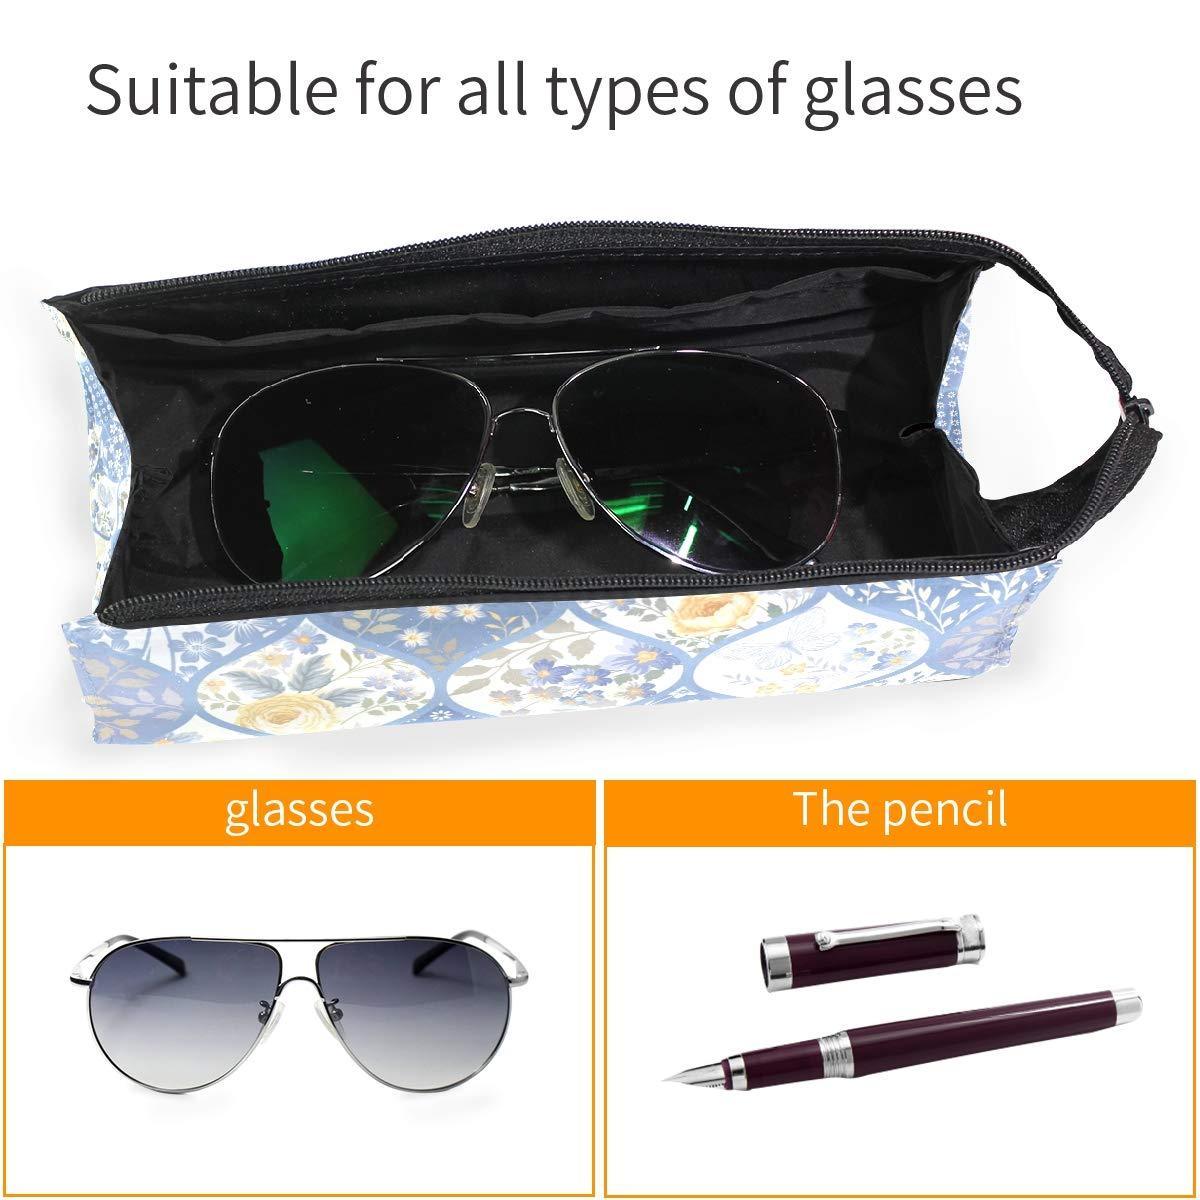 My Little Nest Eyeglass Sunglasses Holder Pouch Bag Butterfly Floral Multi Function Zipper Pen Case Pencil Bag Organizer